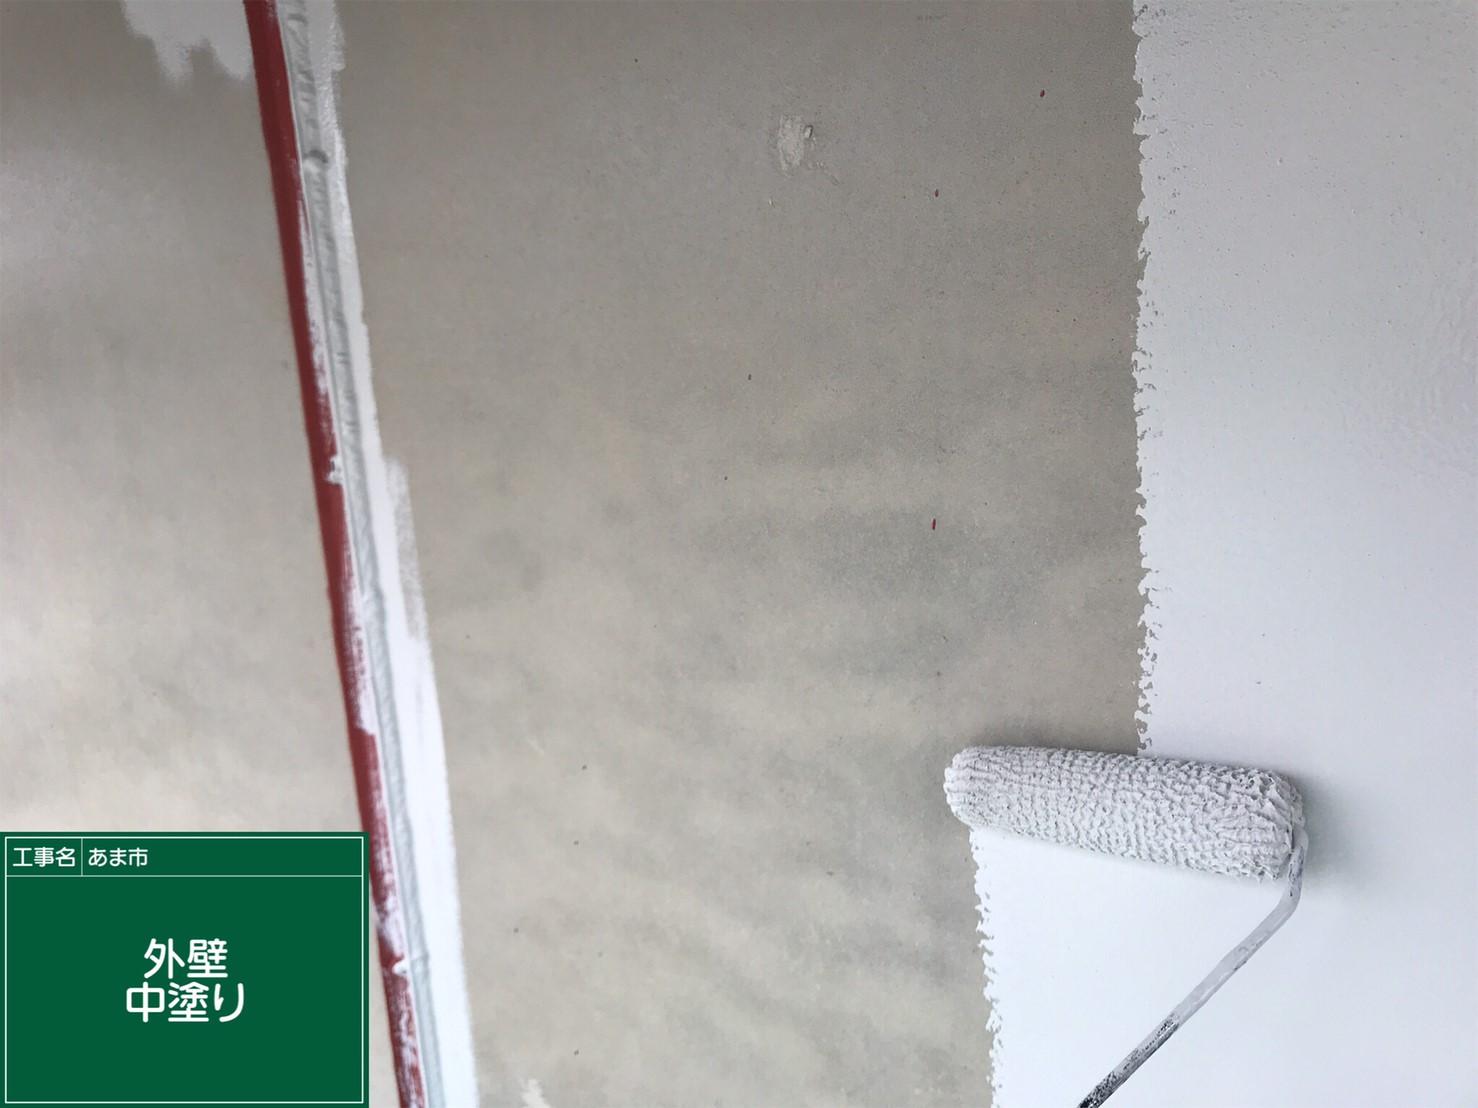 <p></p> <p>外壁 中塗り中です。</p> <p></p>